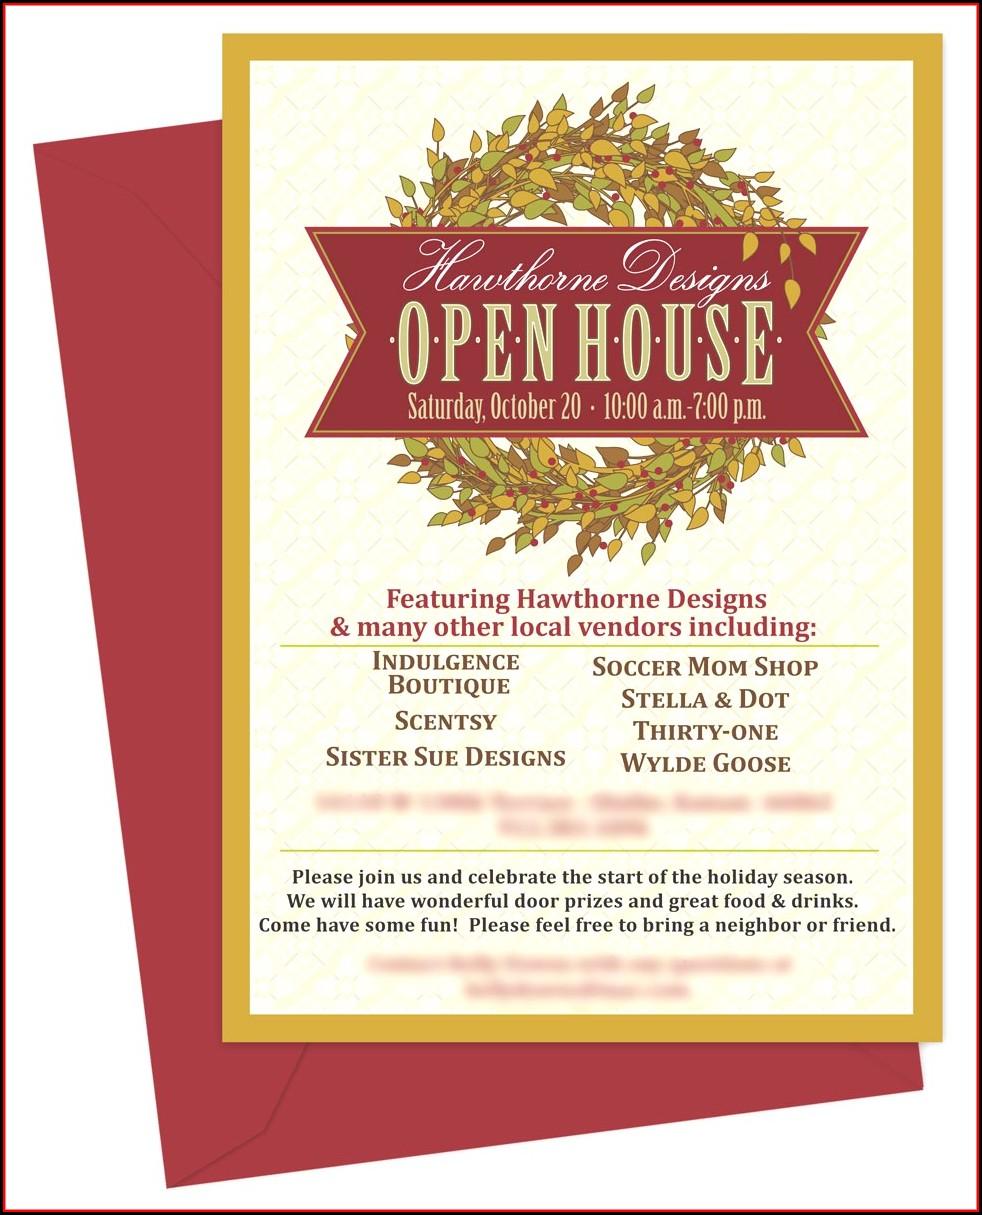 Open House Invitation Sample